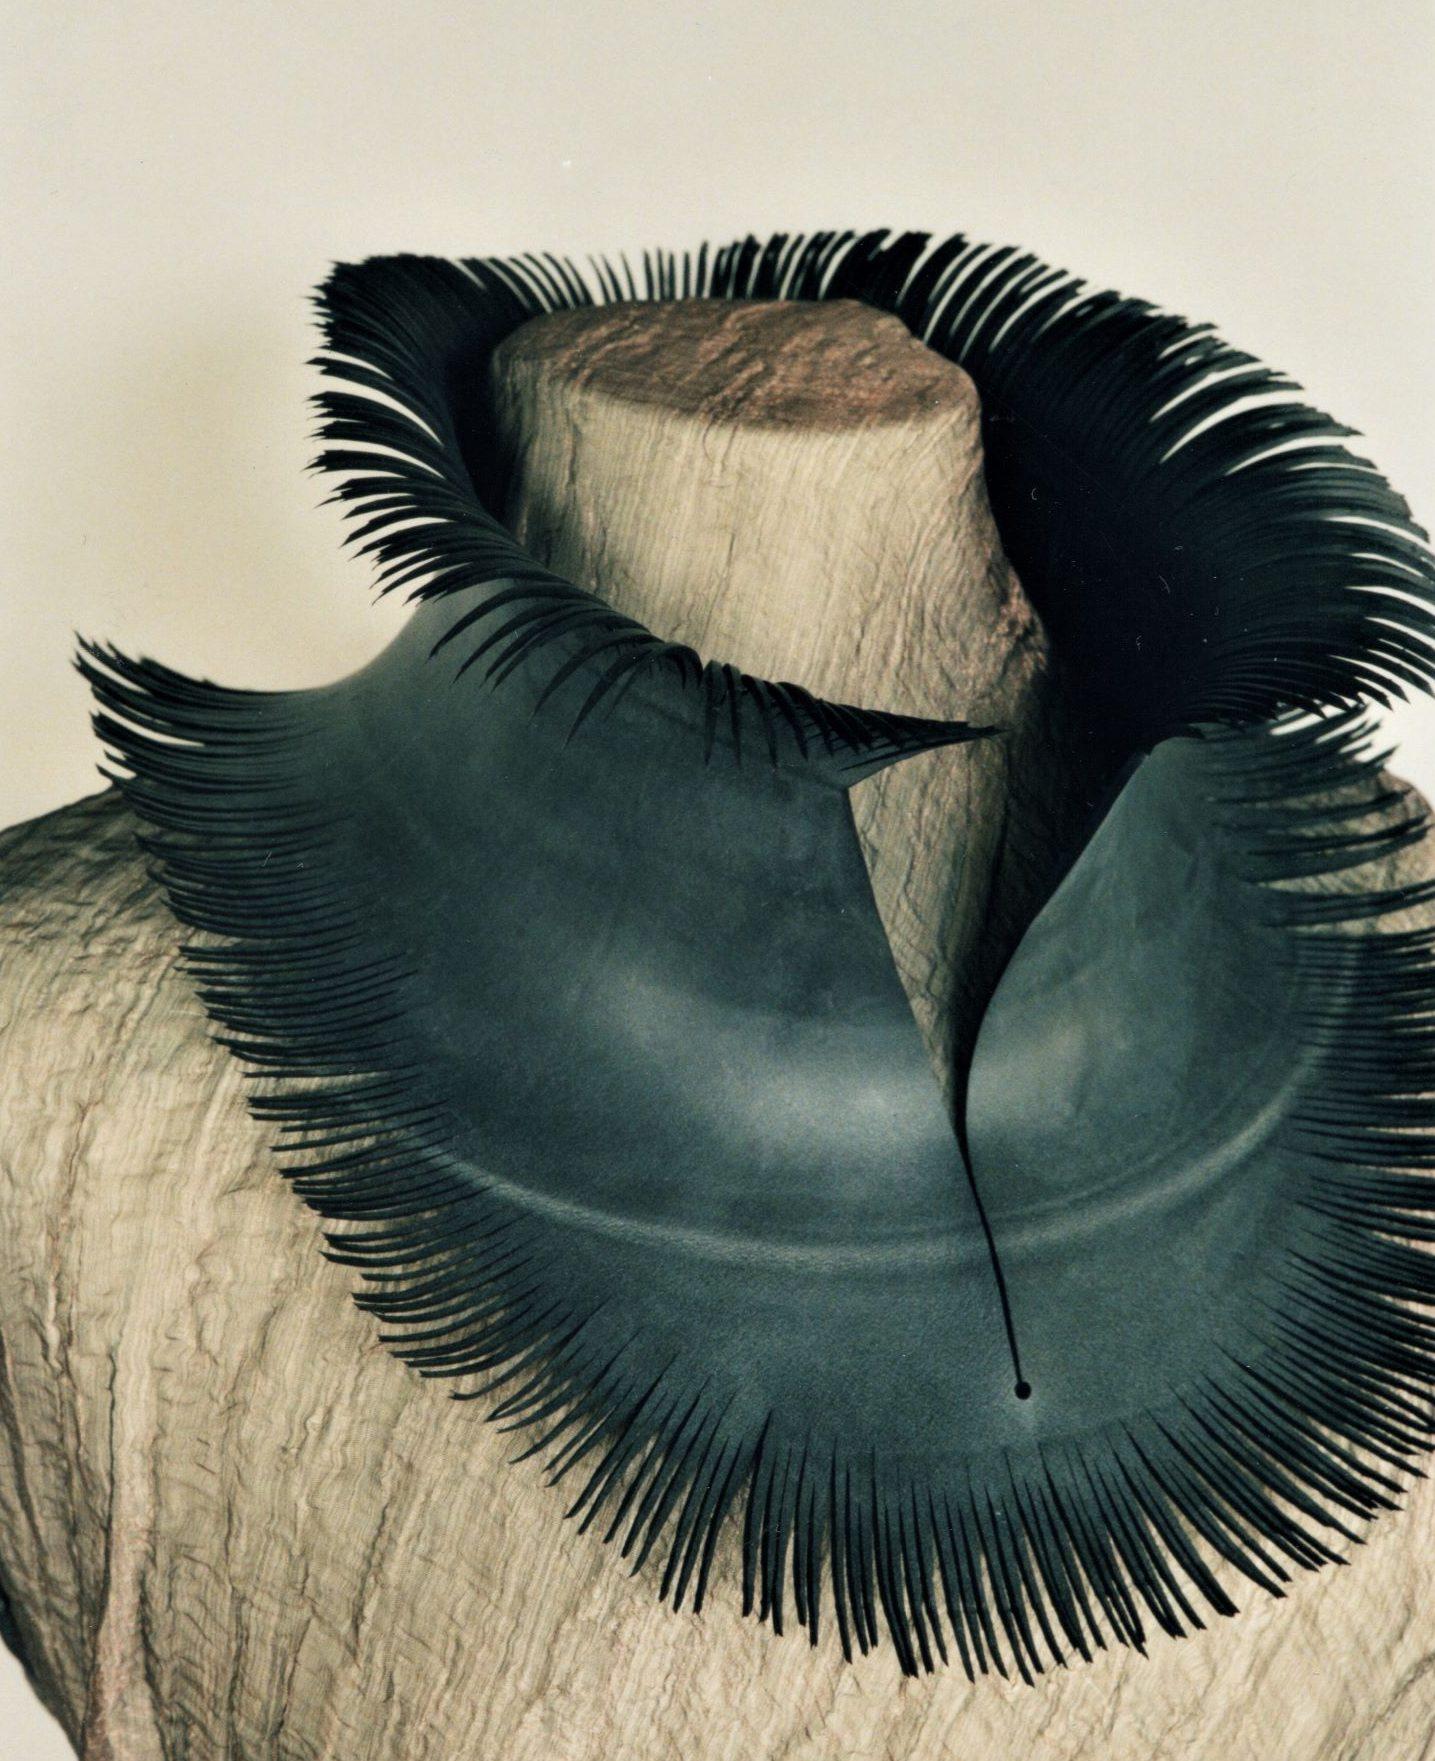 Thea Tolsma, Dona Laura, halssieraad, 2001, rubber